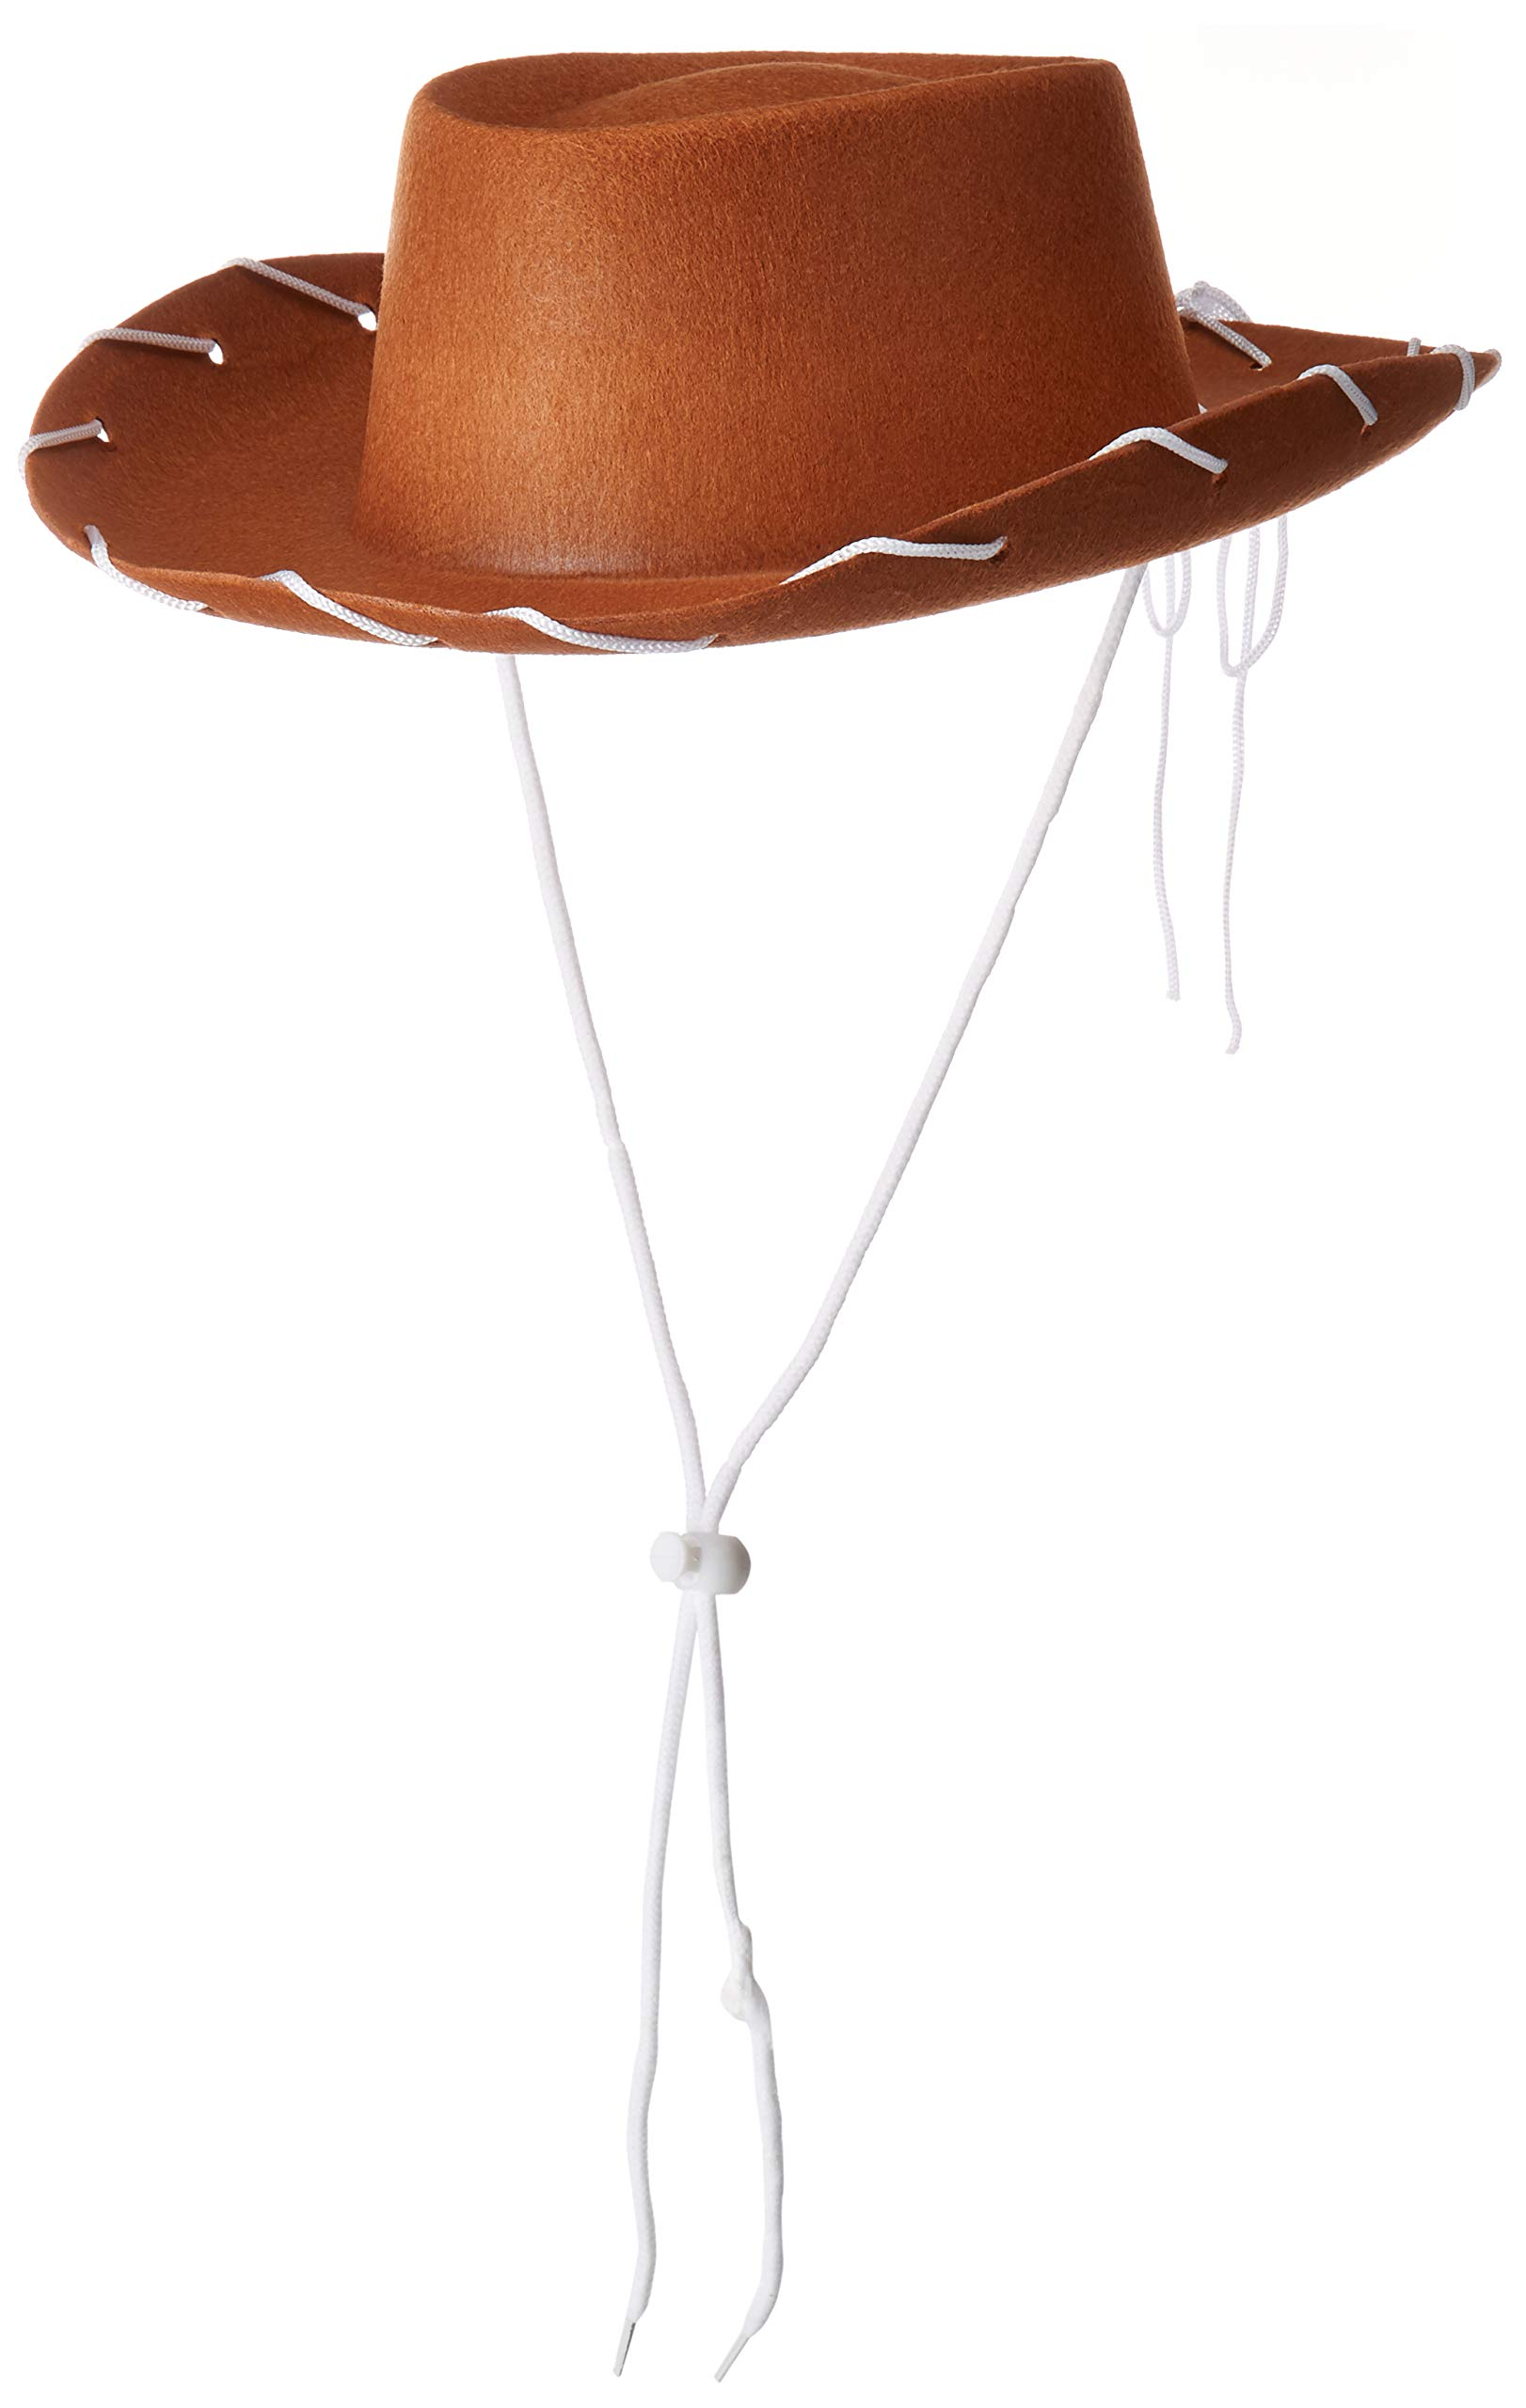 Koolstuffs Children's Cowboy Brown Hat Costume Woody Style by Koolstuffs